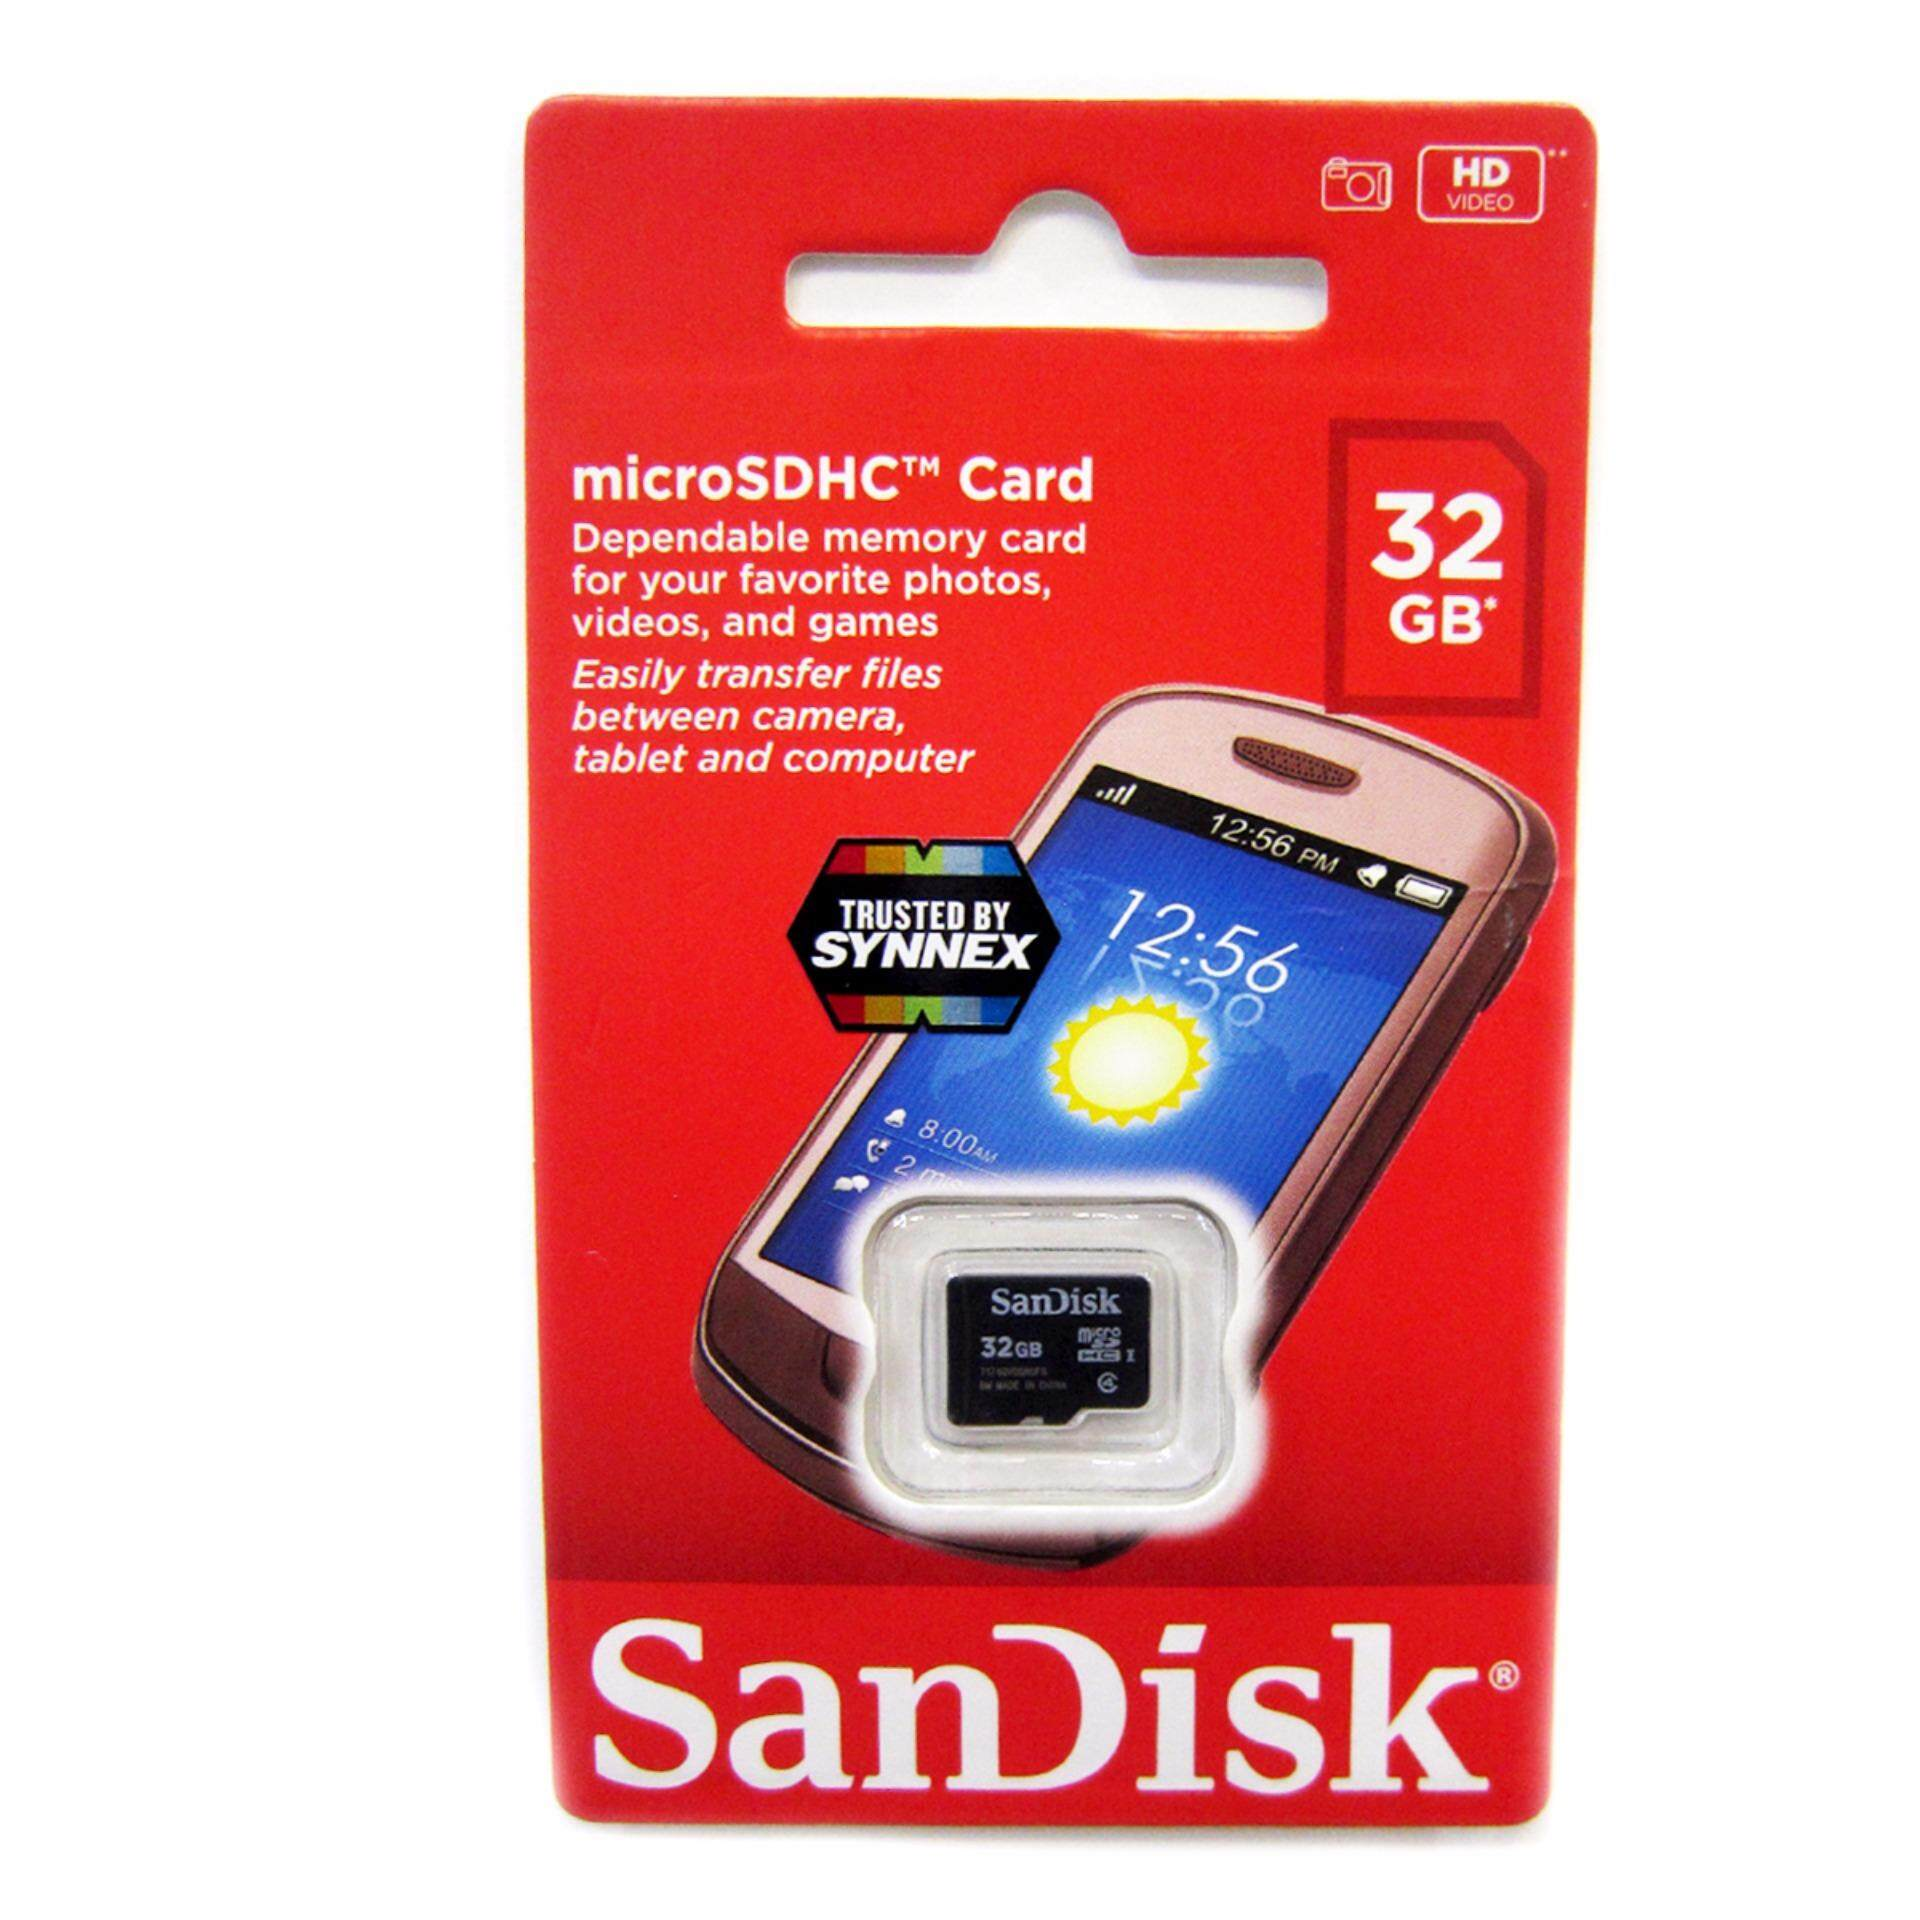 SANDISK MICRO SD 32GB CLASS 4 ของแท้Synnex ประกัน 5ปี ส่งโดย KERRY EXPRESS